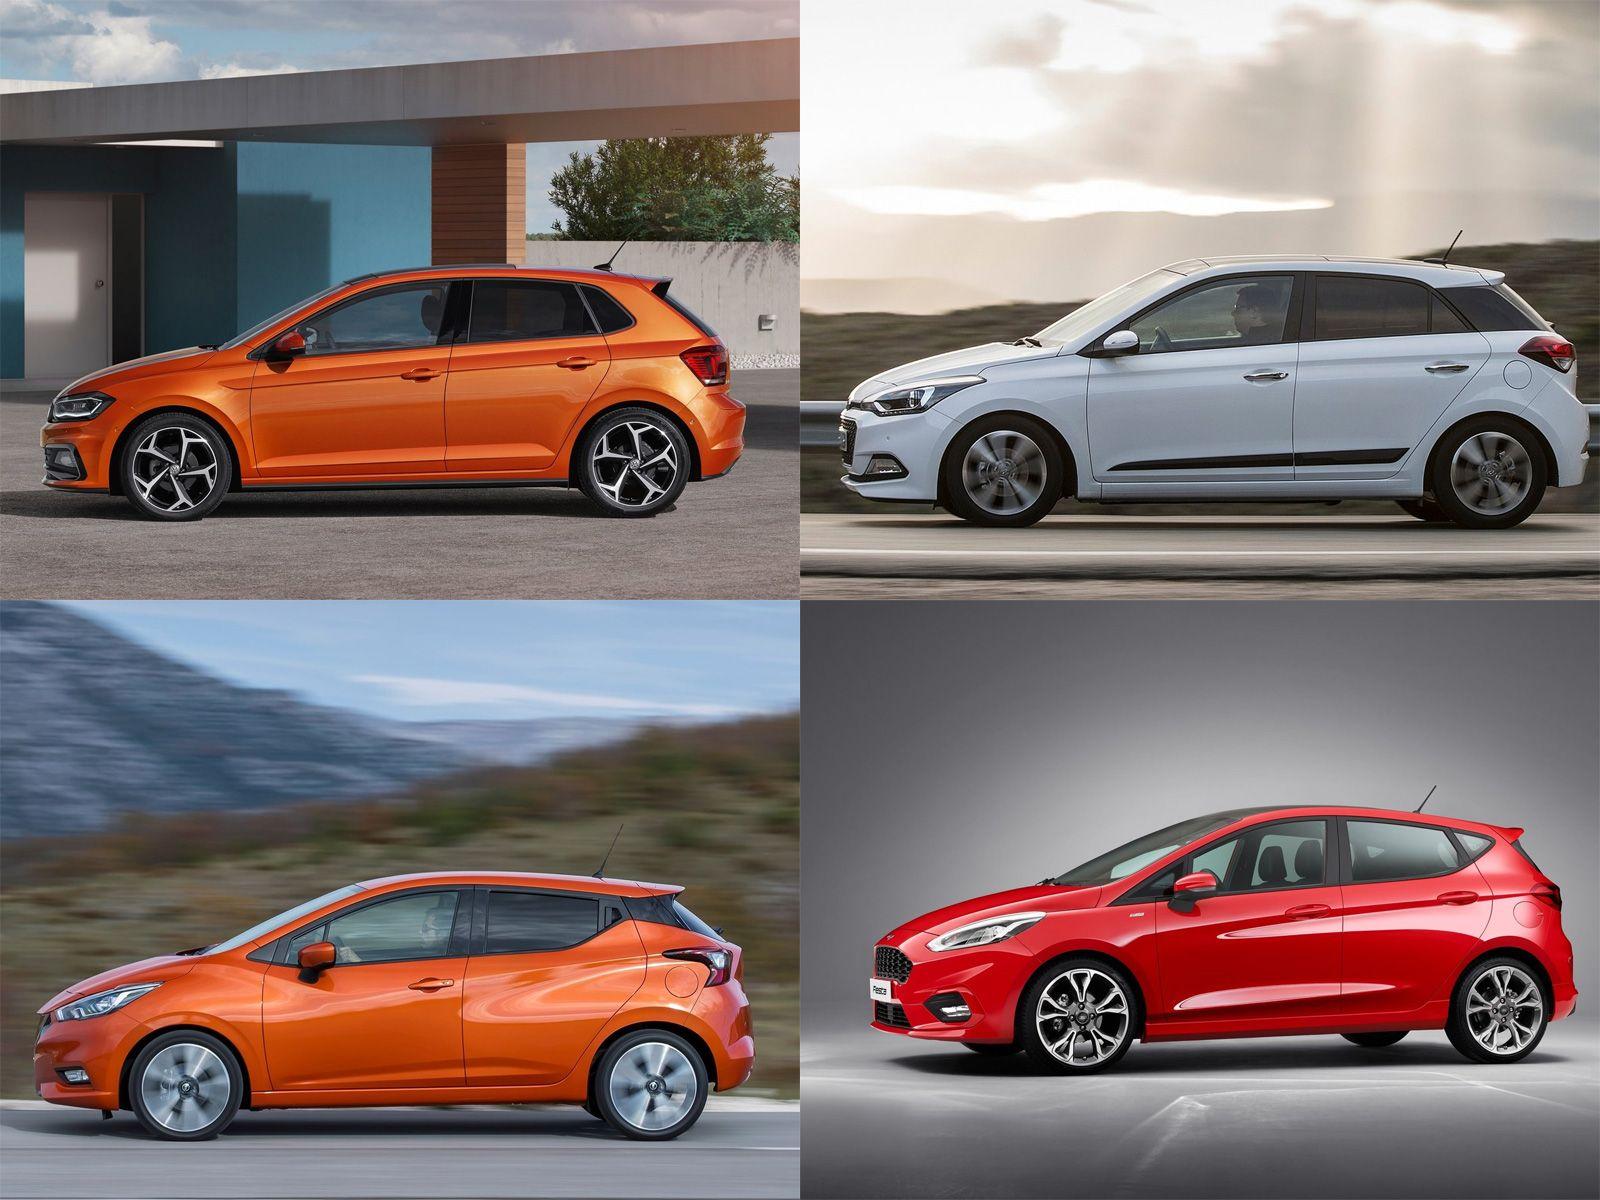 Vw Polo Vs Ford Fiesta Vs Nissan Micra Vs Hyundai I20